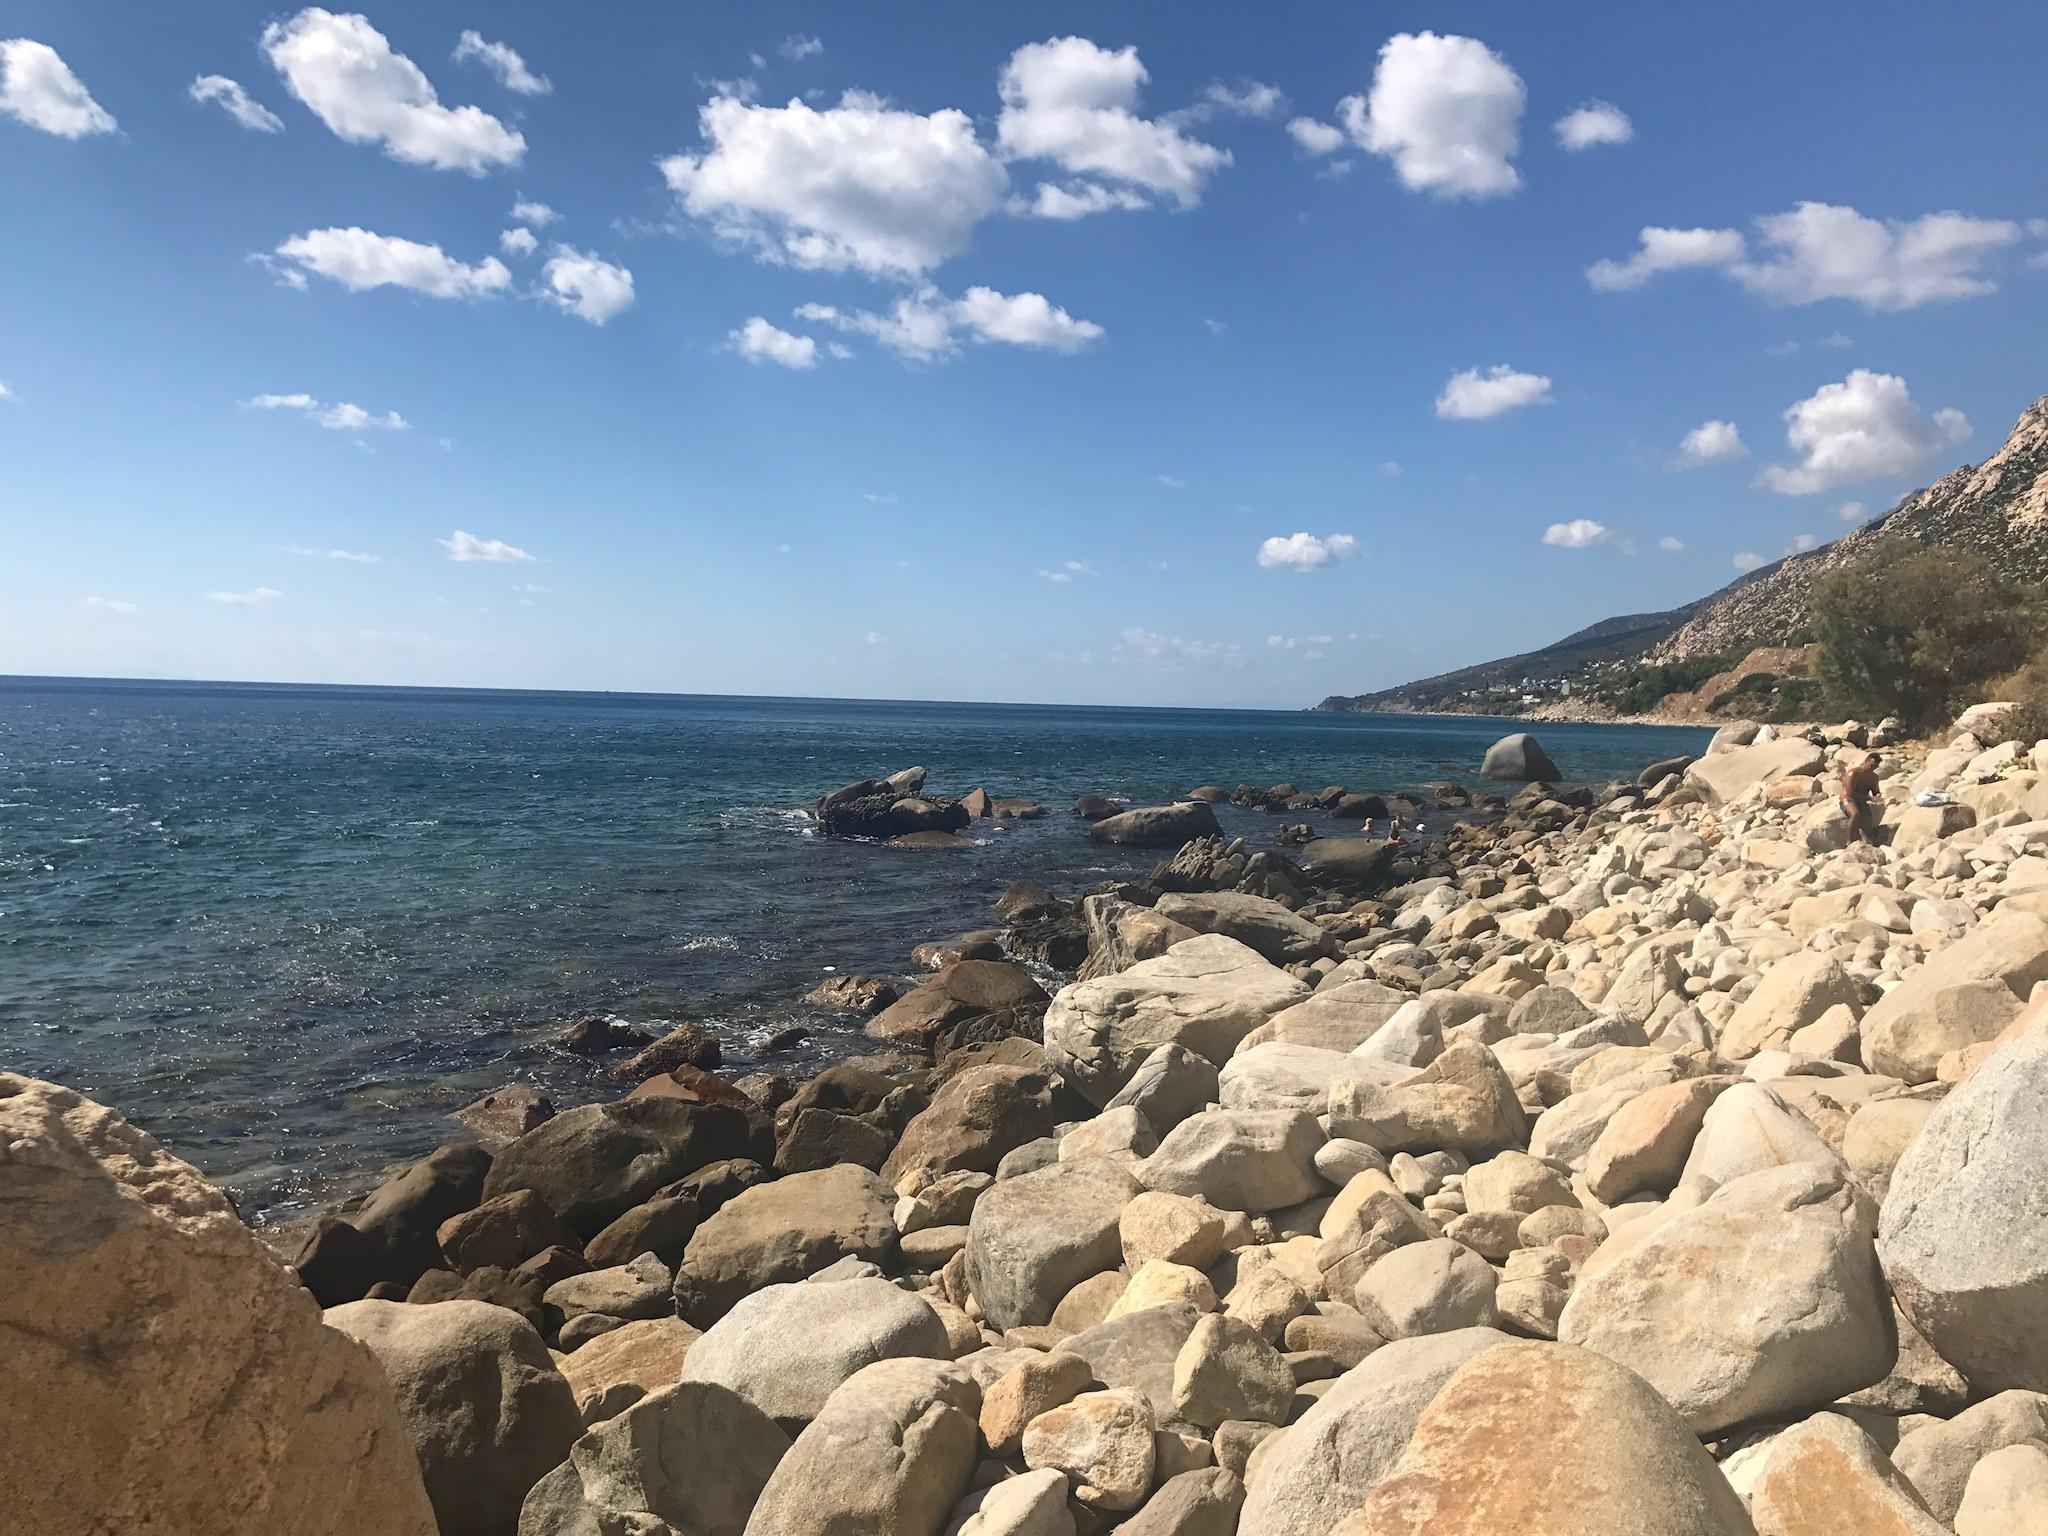 Lefkada thermal spring by the sea   Credit: Talita Bateman